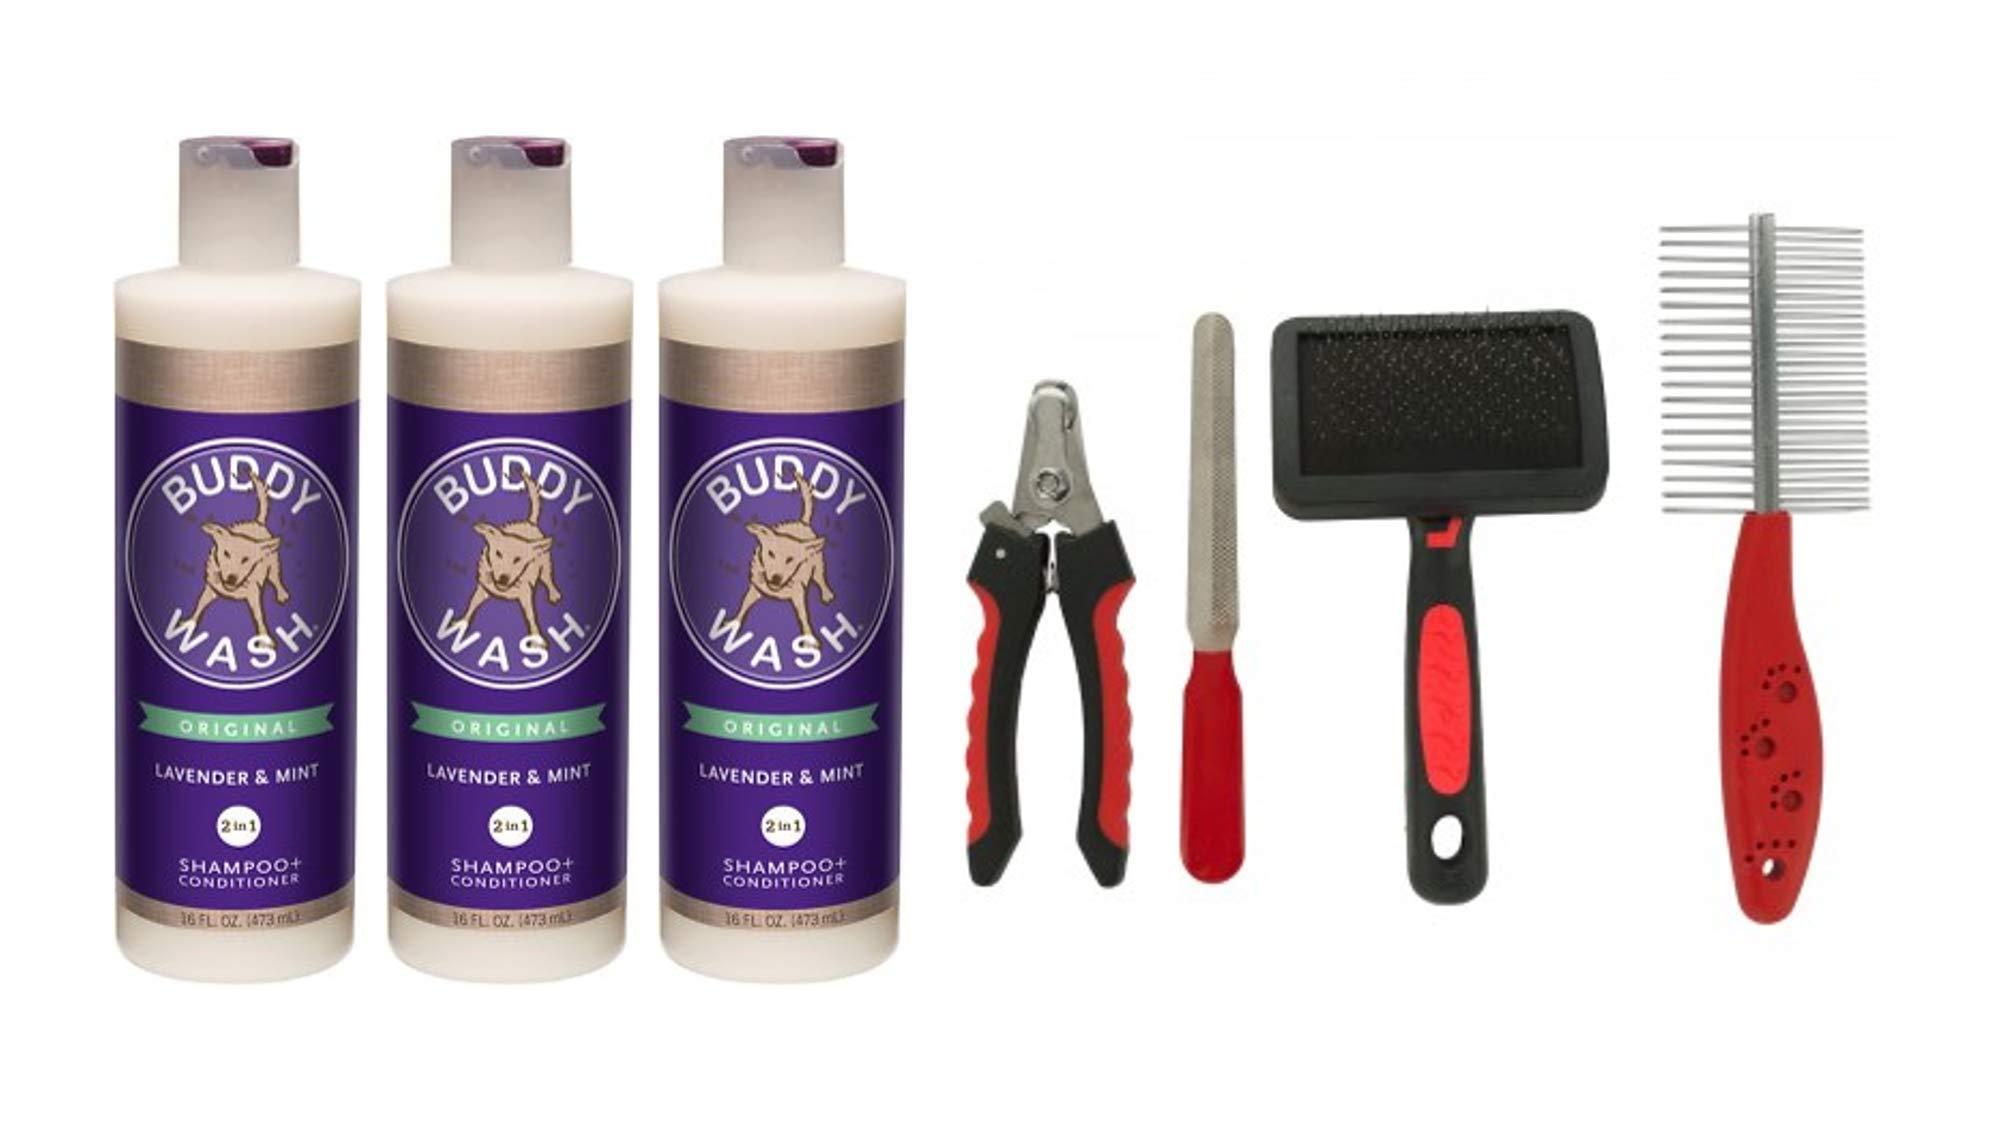 Cloud Star Buddy Wash Dog Shampoo and Conditioner (3) 16 oz Bottles Plus 1 Dog Brush by Cloud Star